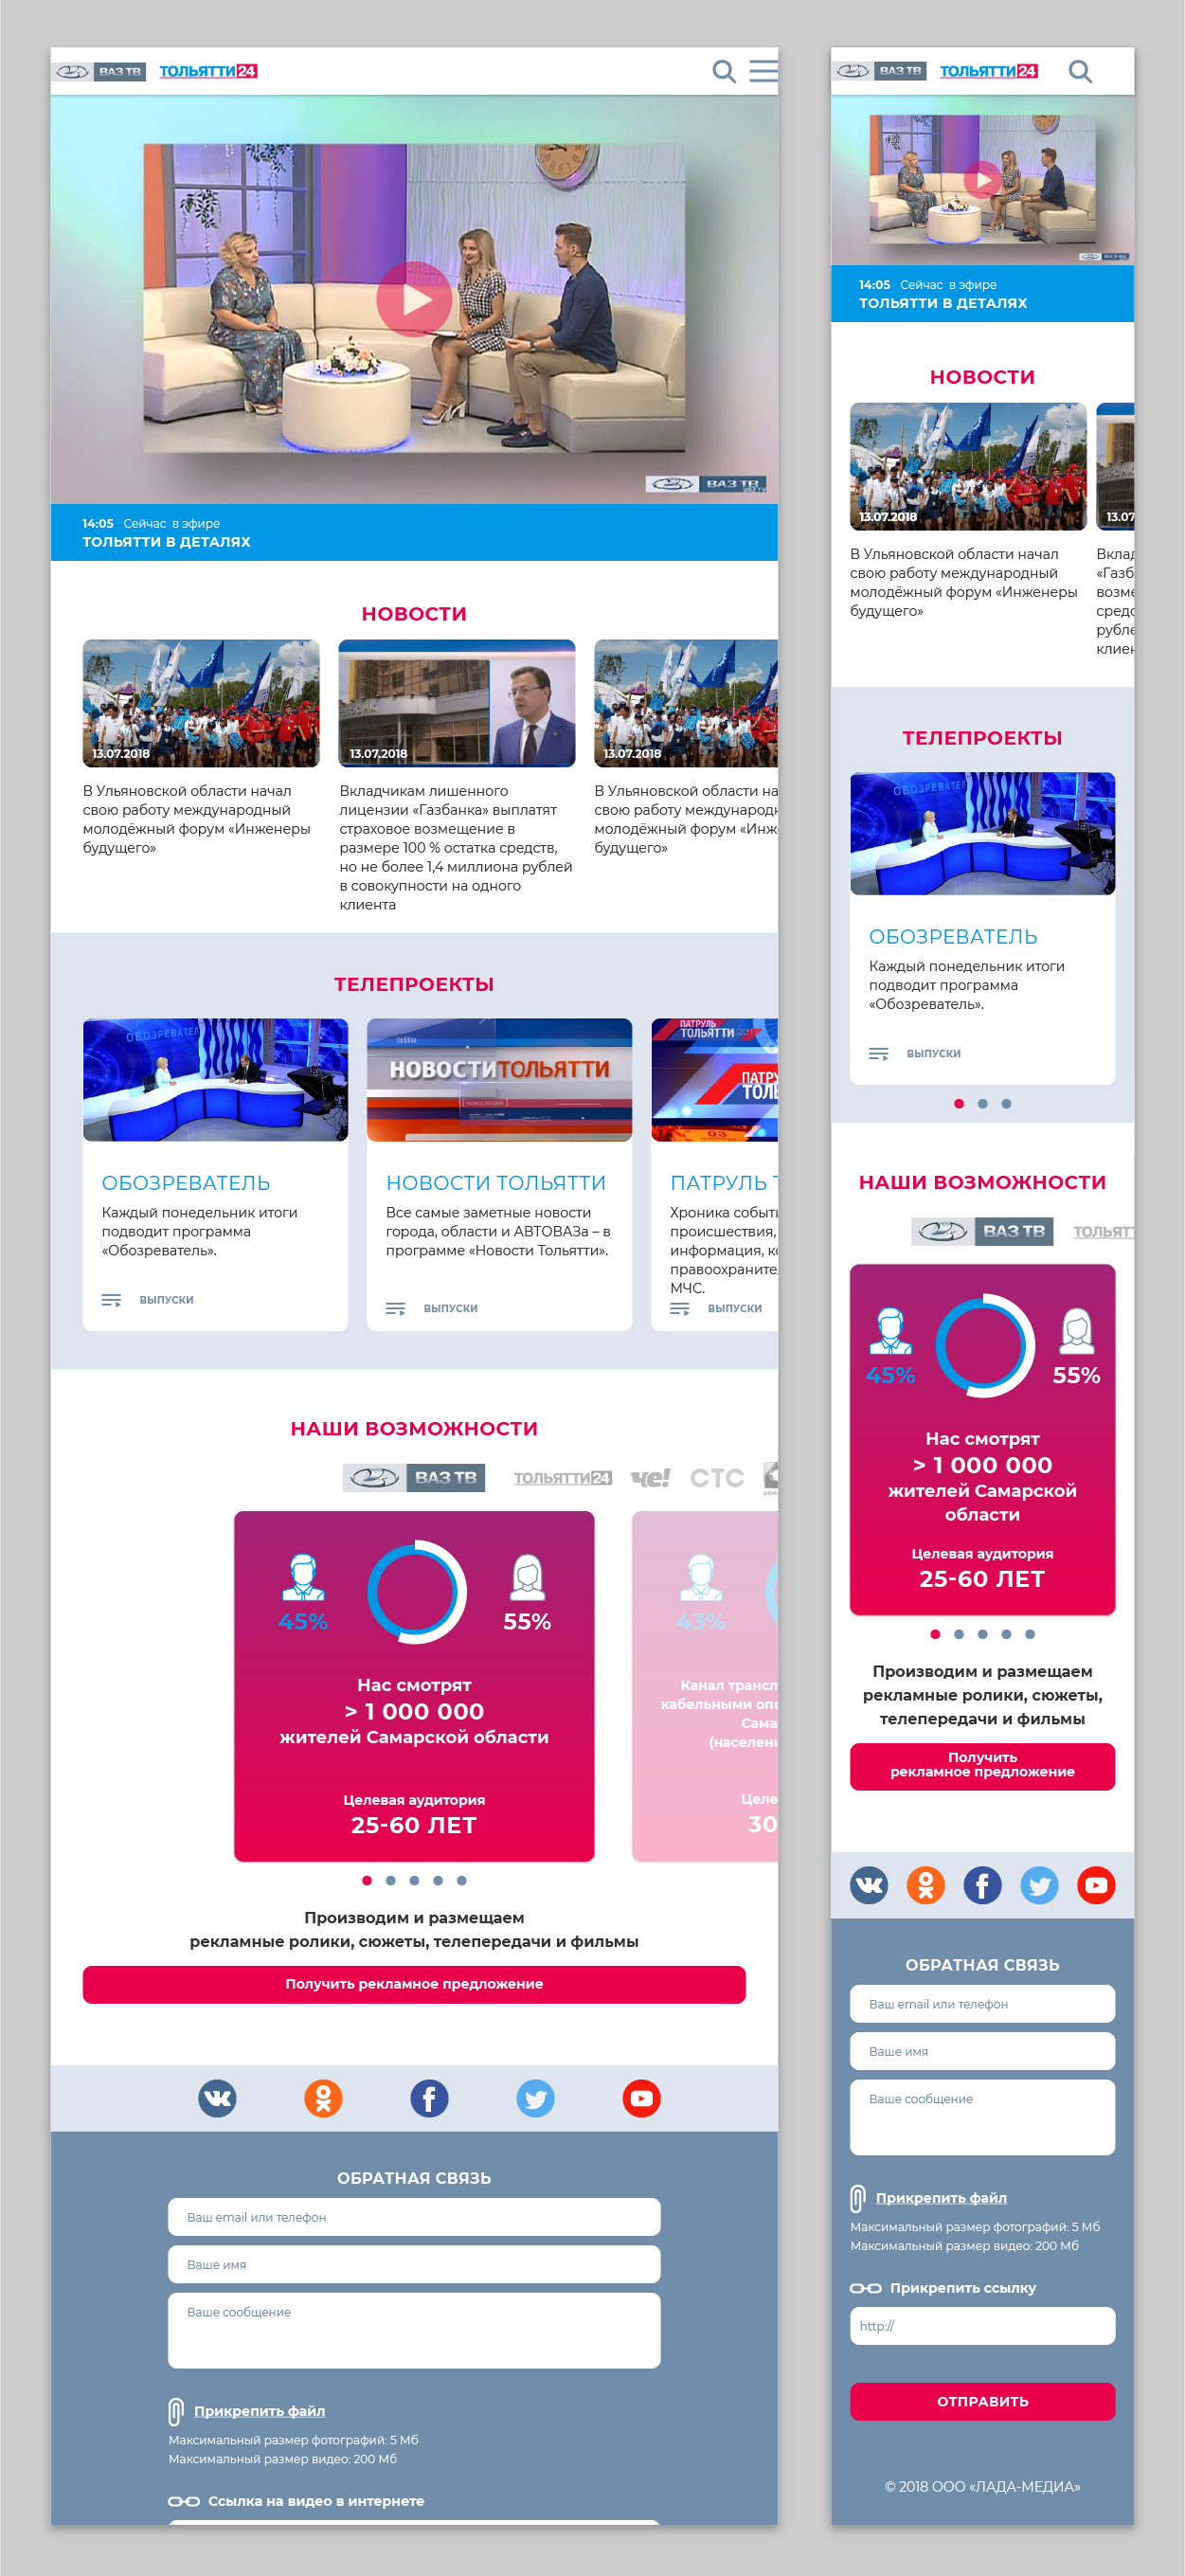 Страницы сайта телеканала «ВАЗ ТВ».